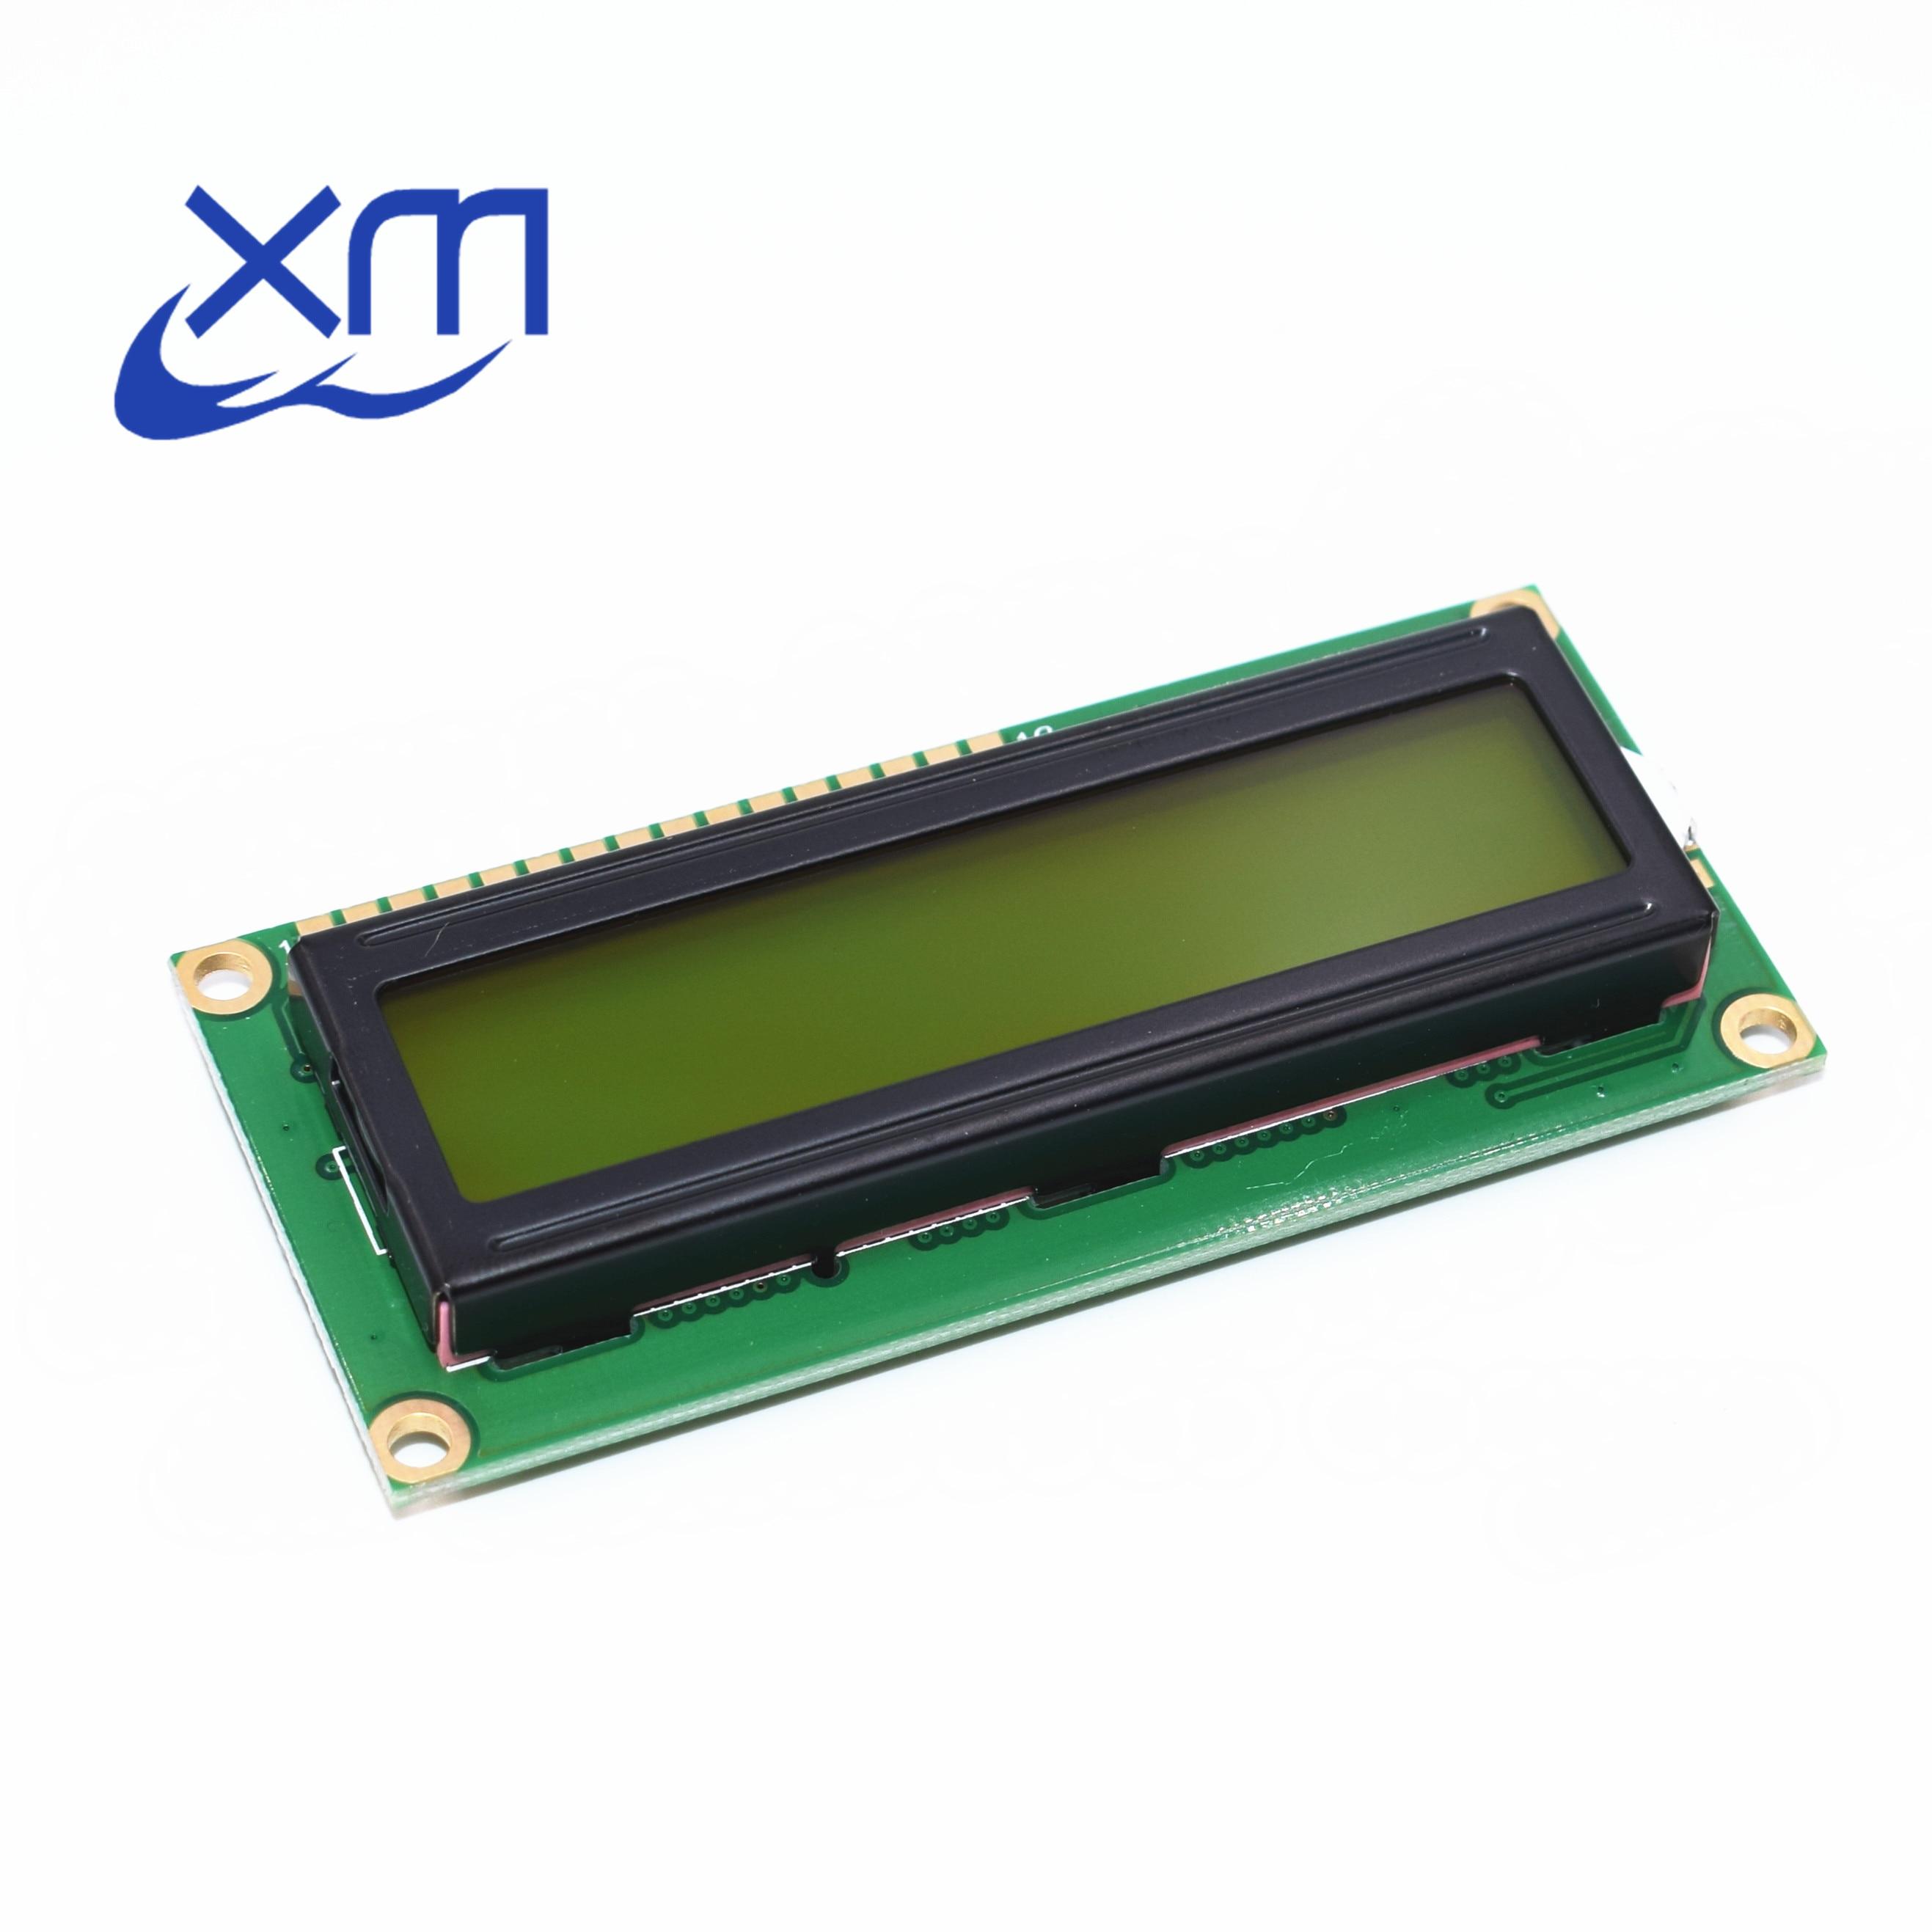 20pcs/lot , New 1602 LCD Display Module , LCD 16x2, Yellow Green Screen Backlight , 5V